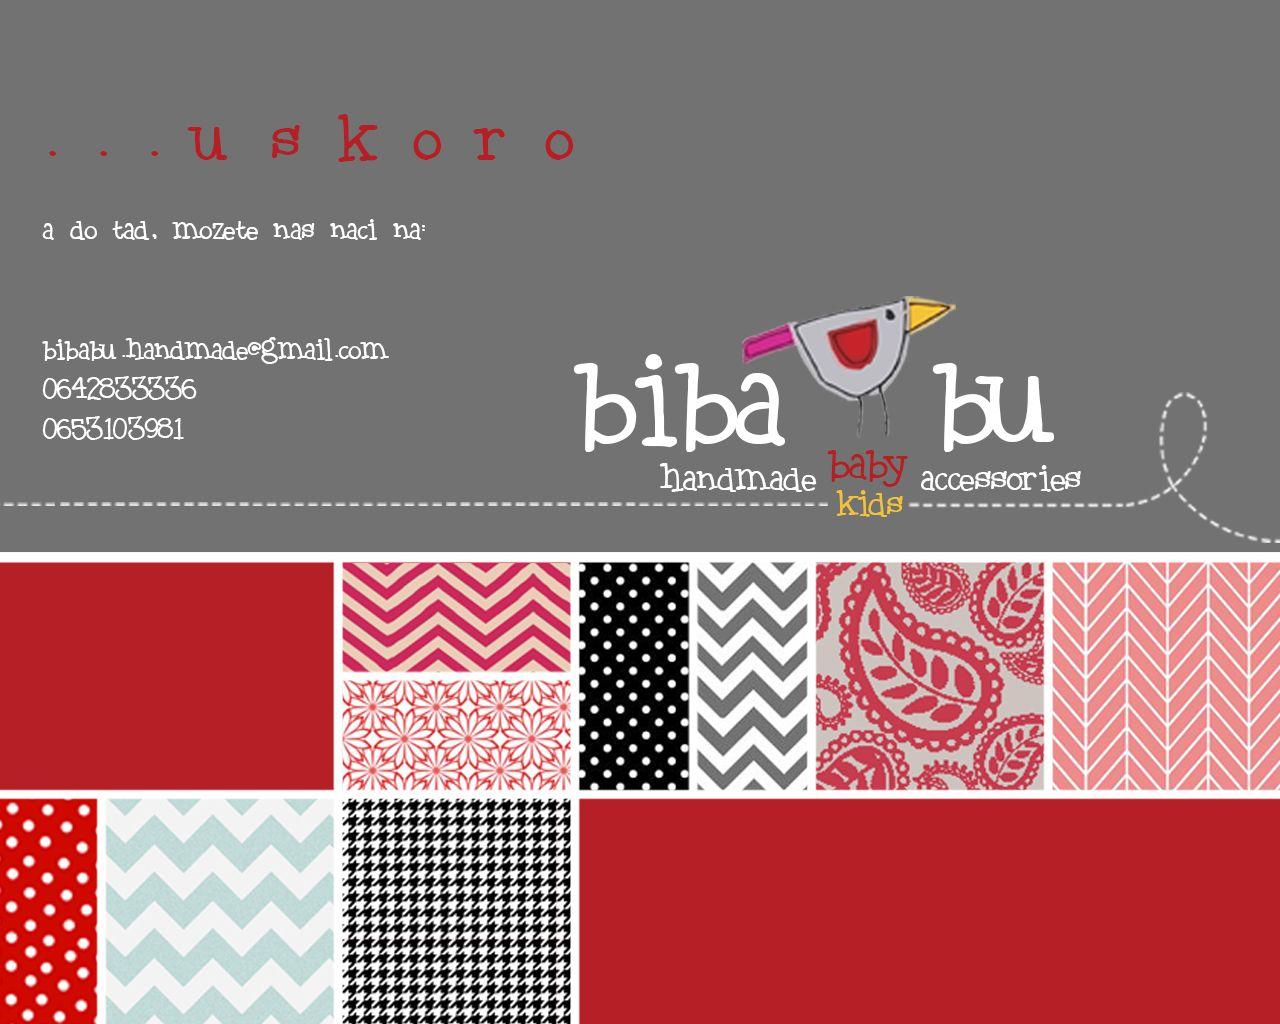 Bibabu baby hairstyle pinterest check